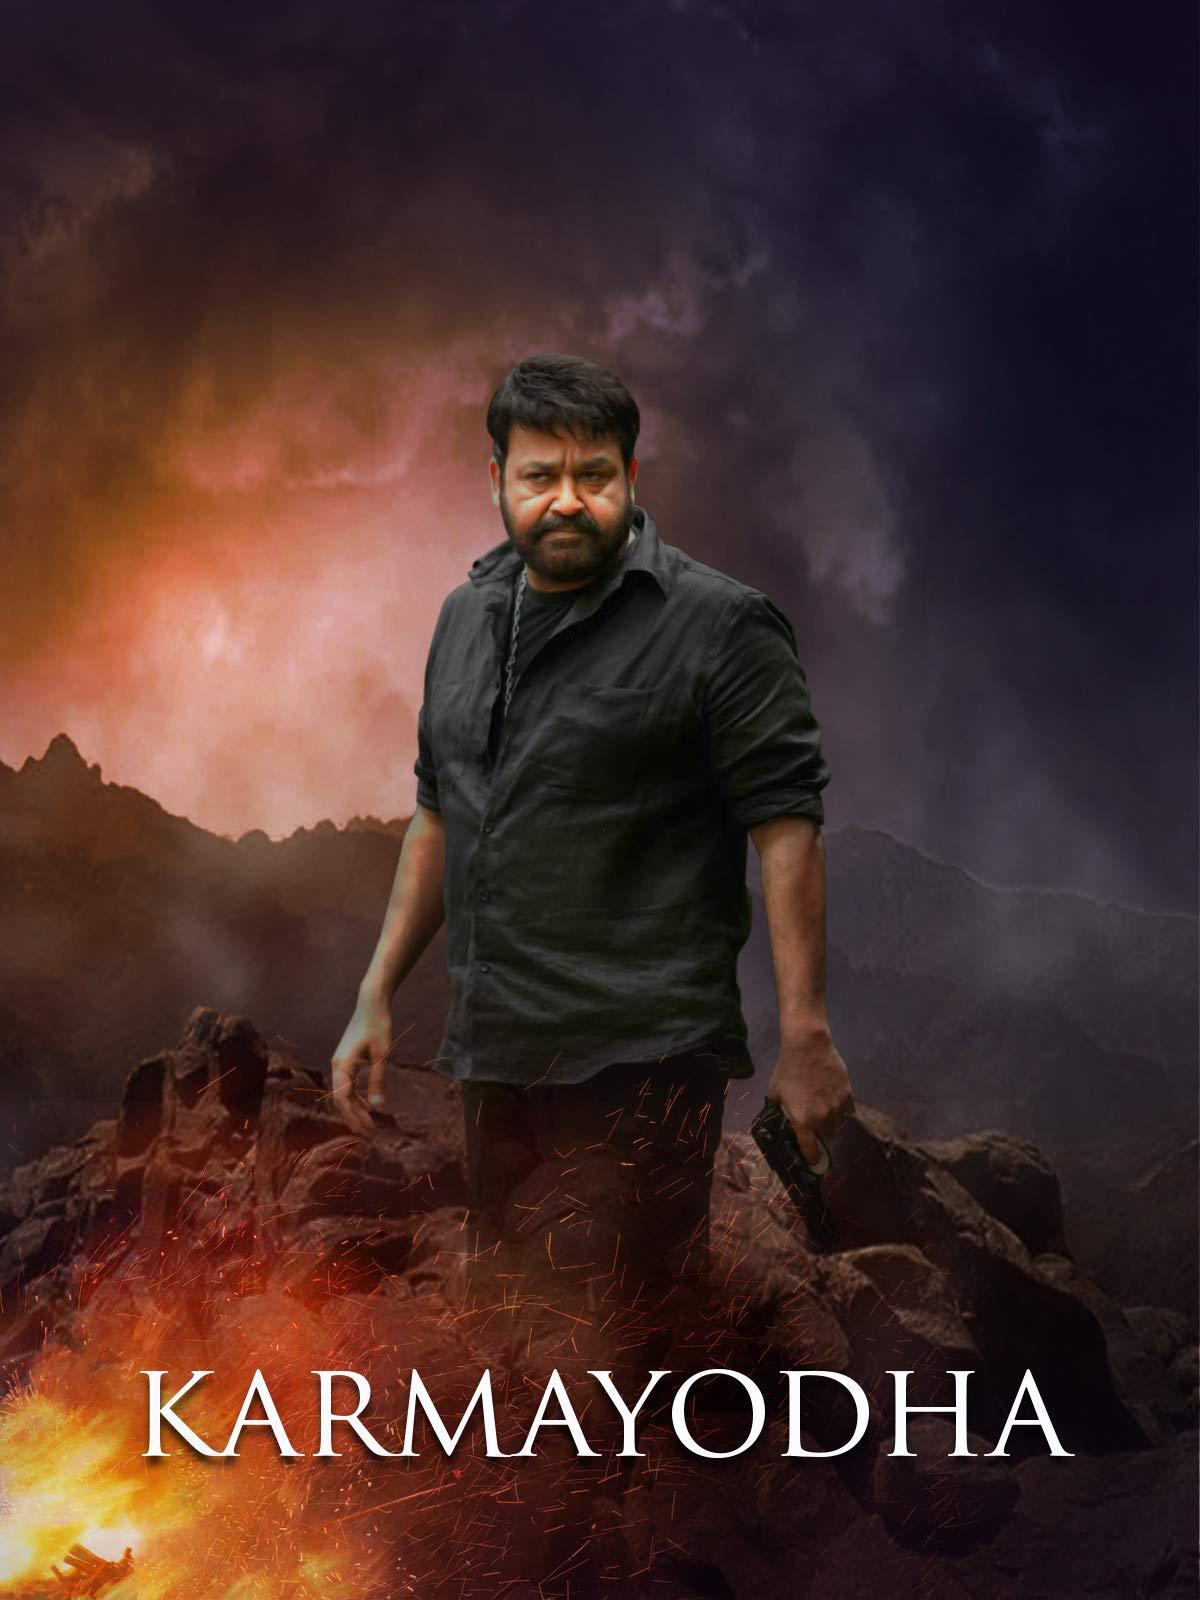 Karma Yodha (2012) South Movie Hindi Dubbed 720p HDRip AAC[SRK]